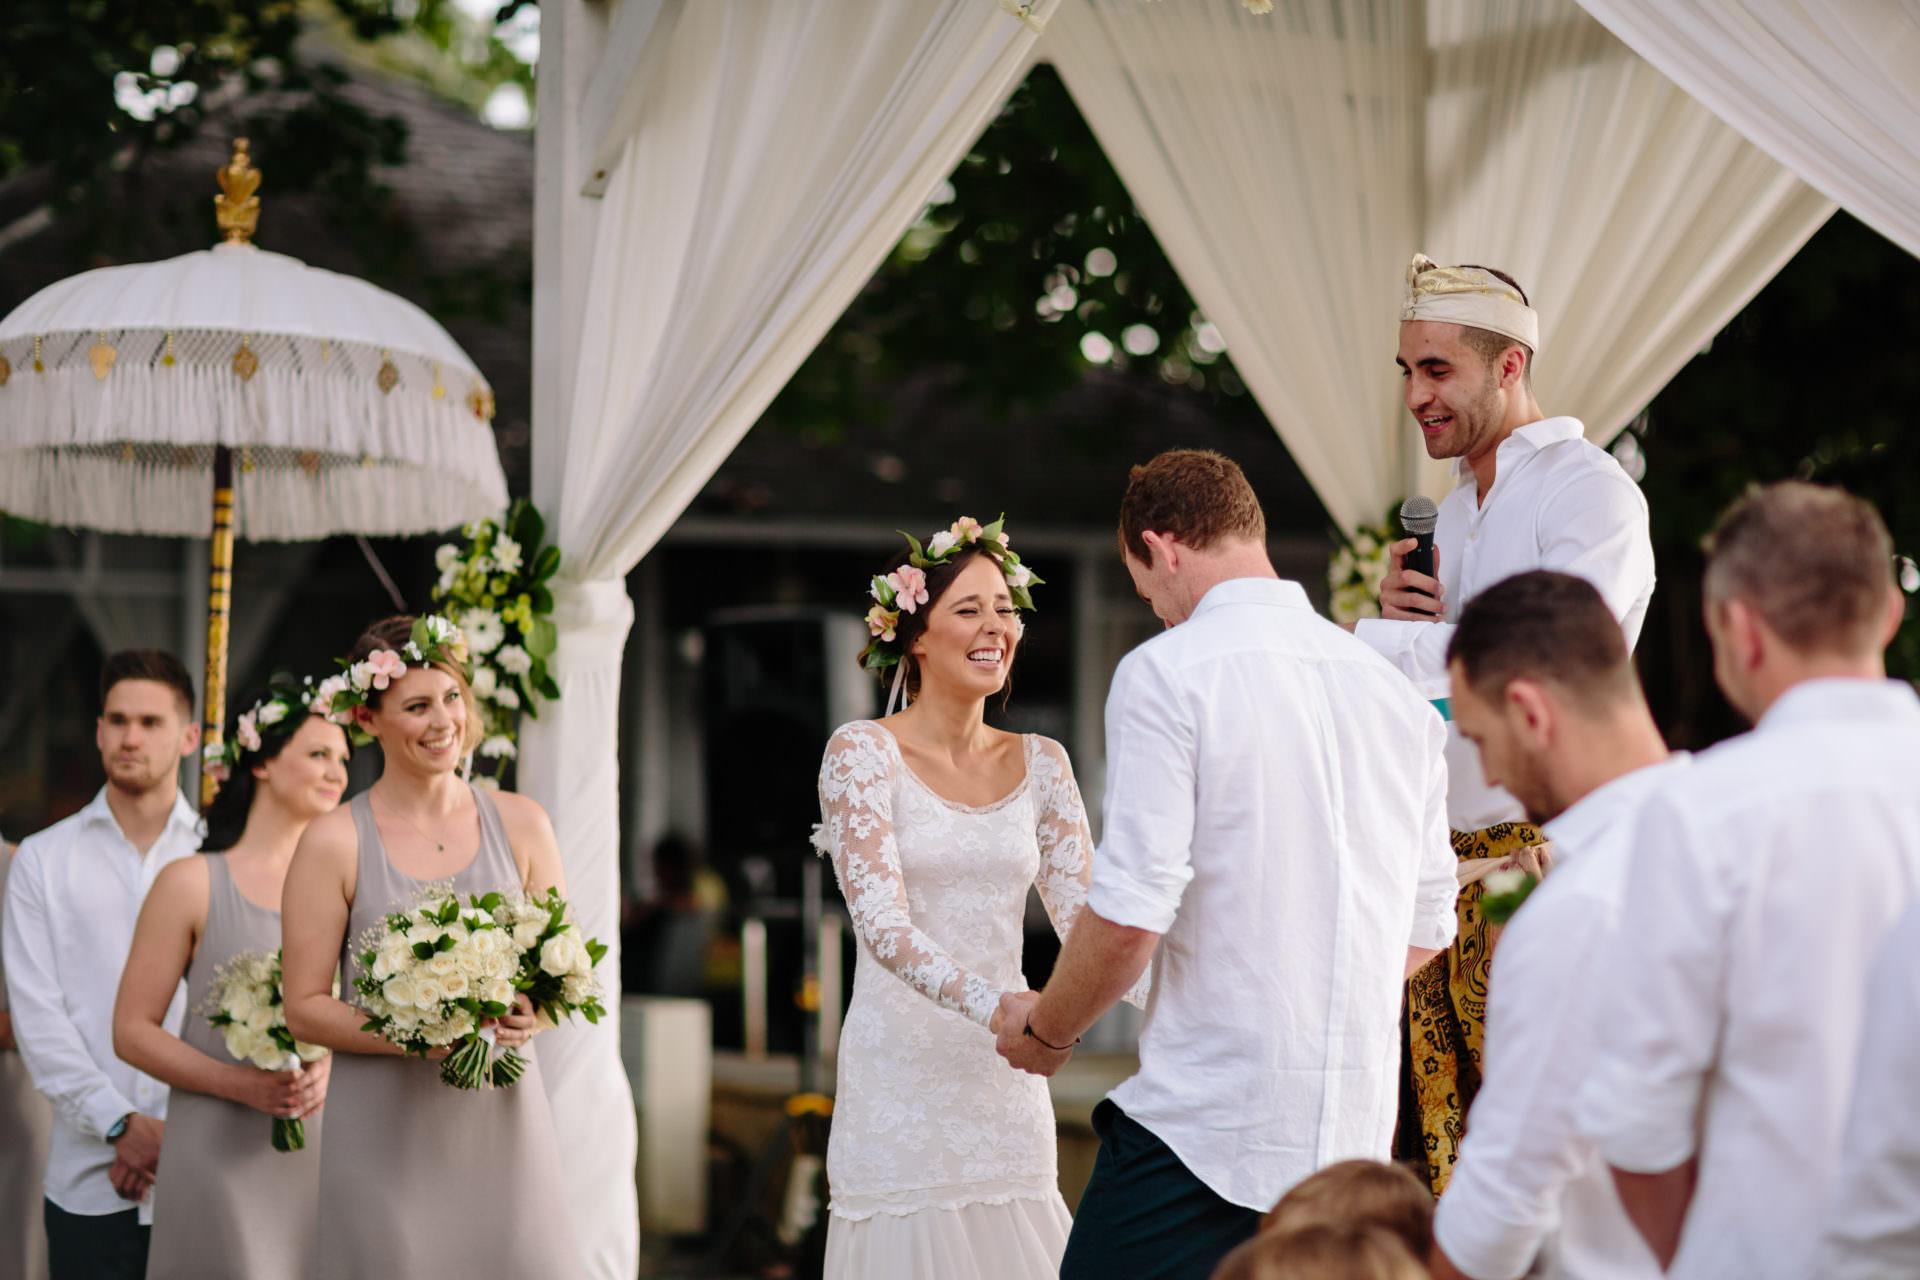 marc-megan-wedding-bali-the-official-photographers_TOP_0606